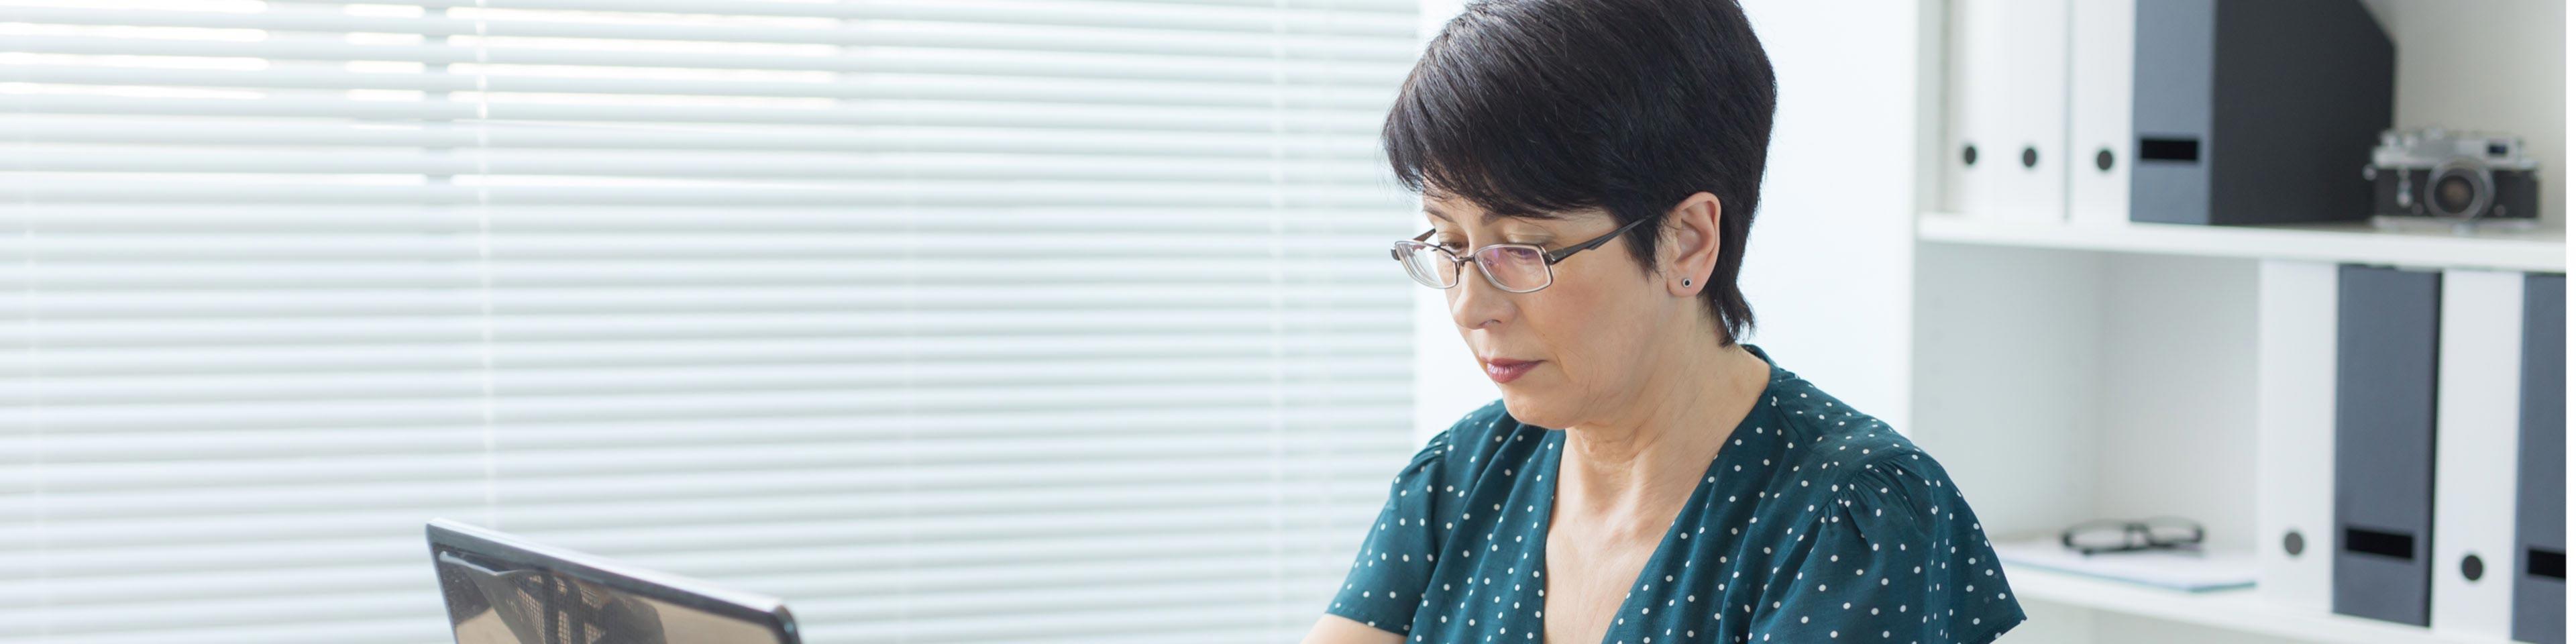 woman researching employee insubordination